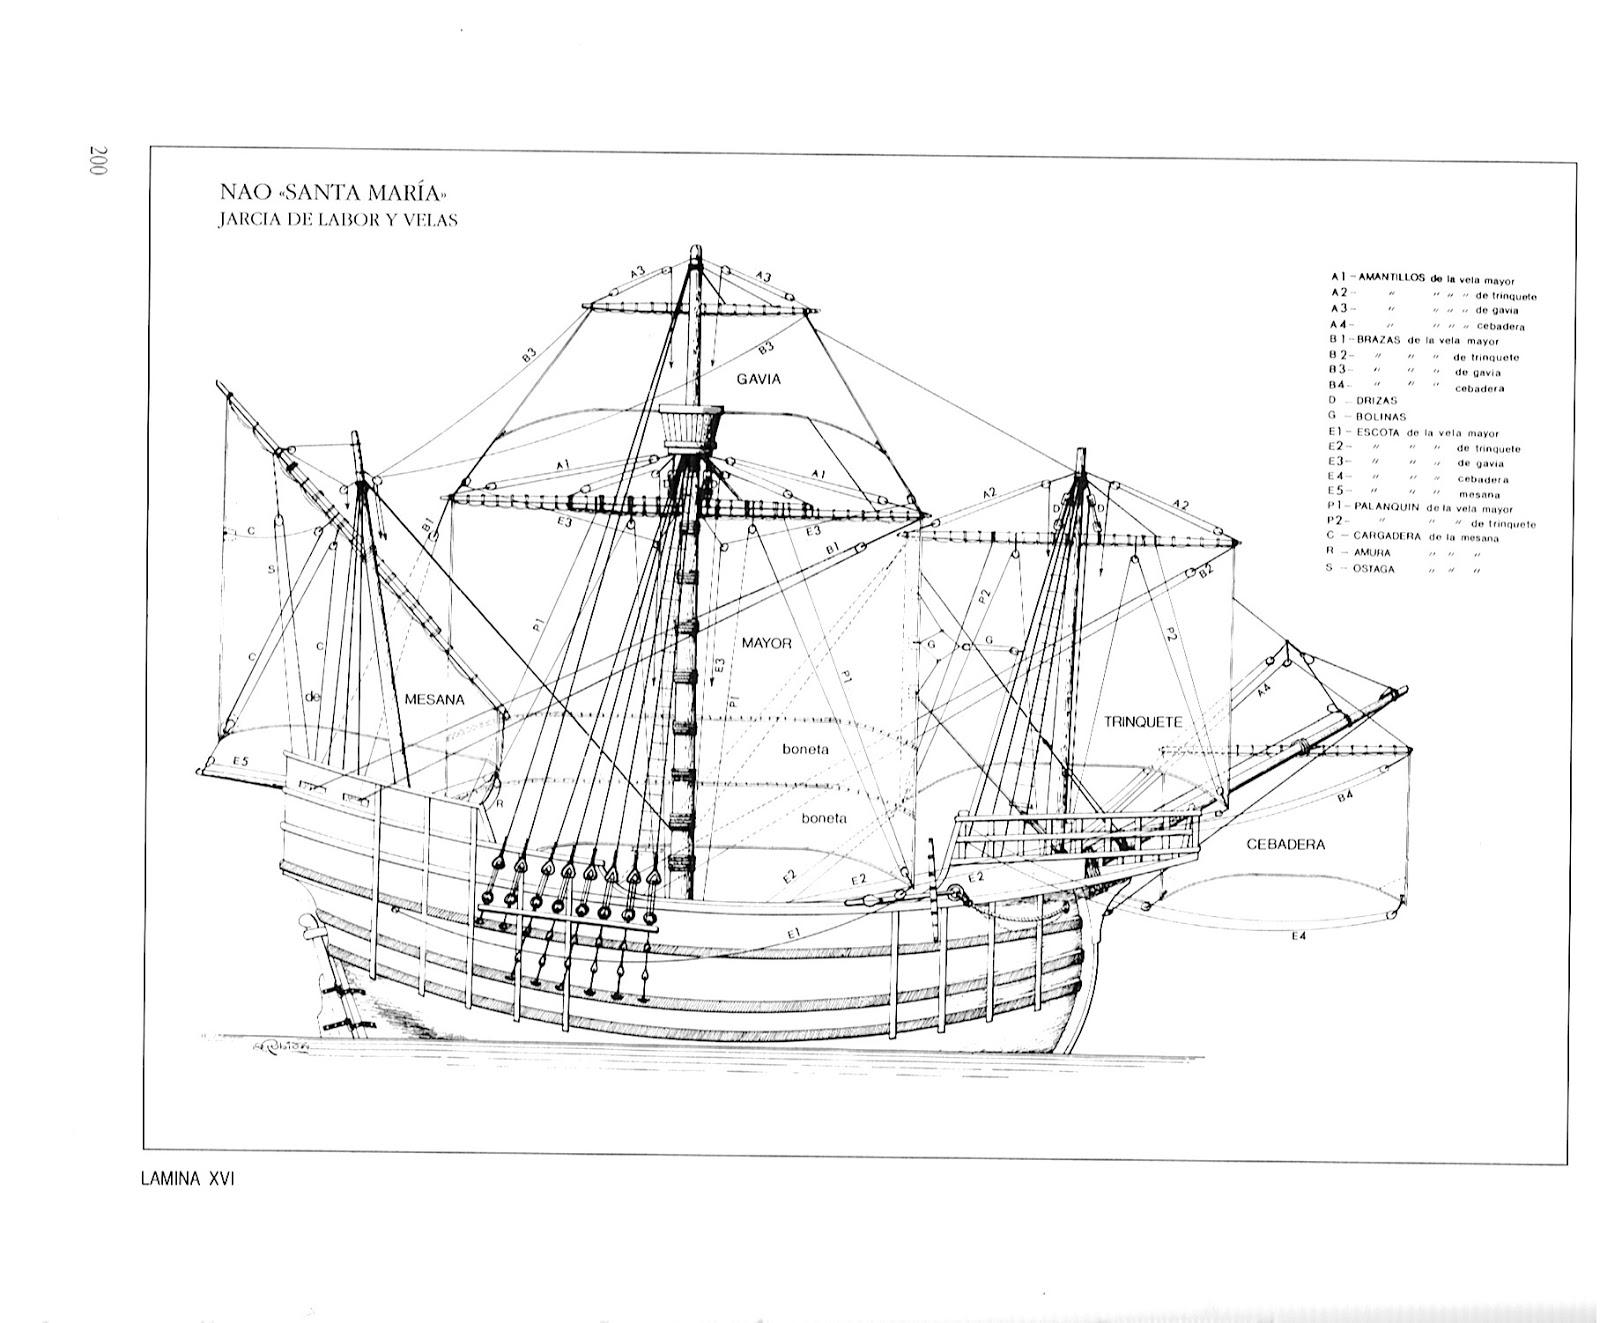 hammerhead twister 150 wiring diagram danfoss diverter valve tomberlin crossfire 150r diagrams